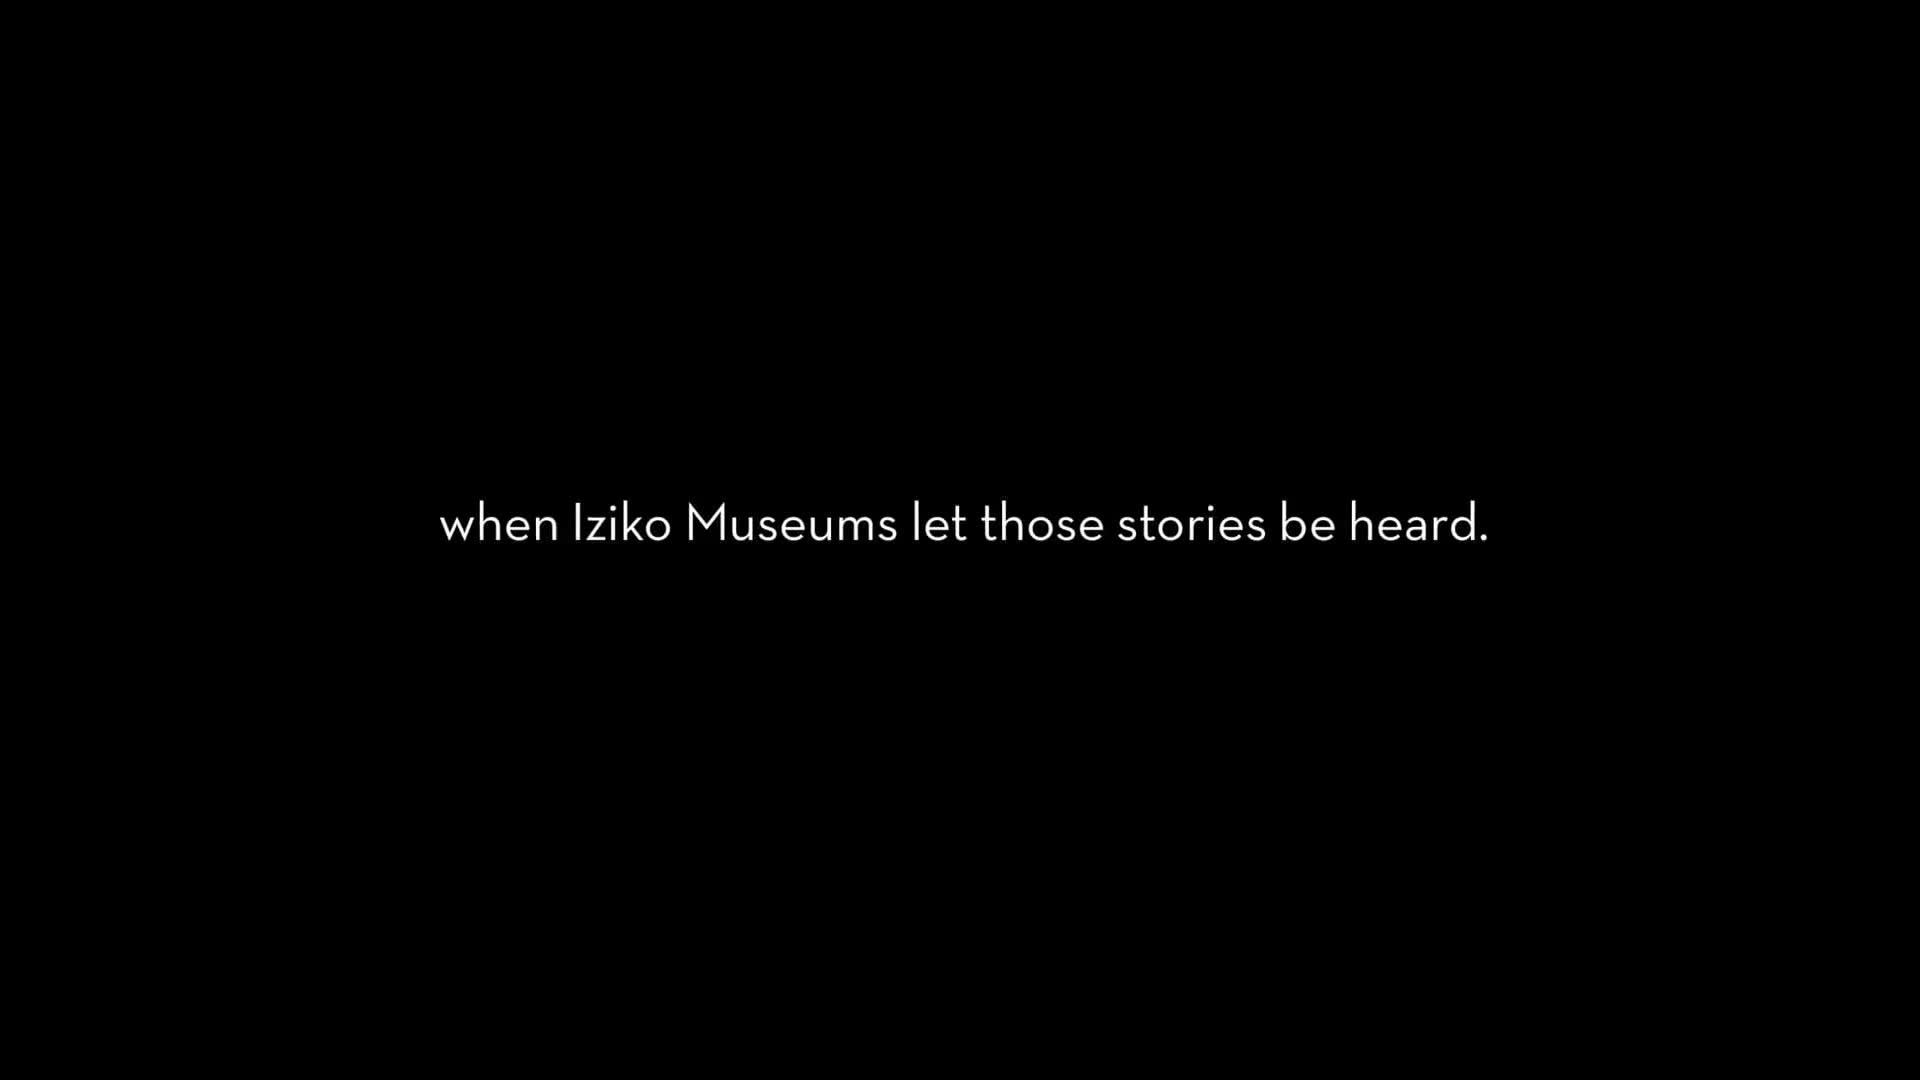 Iziko南非自然历史博物馆 《Museum Hidden Heritage》